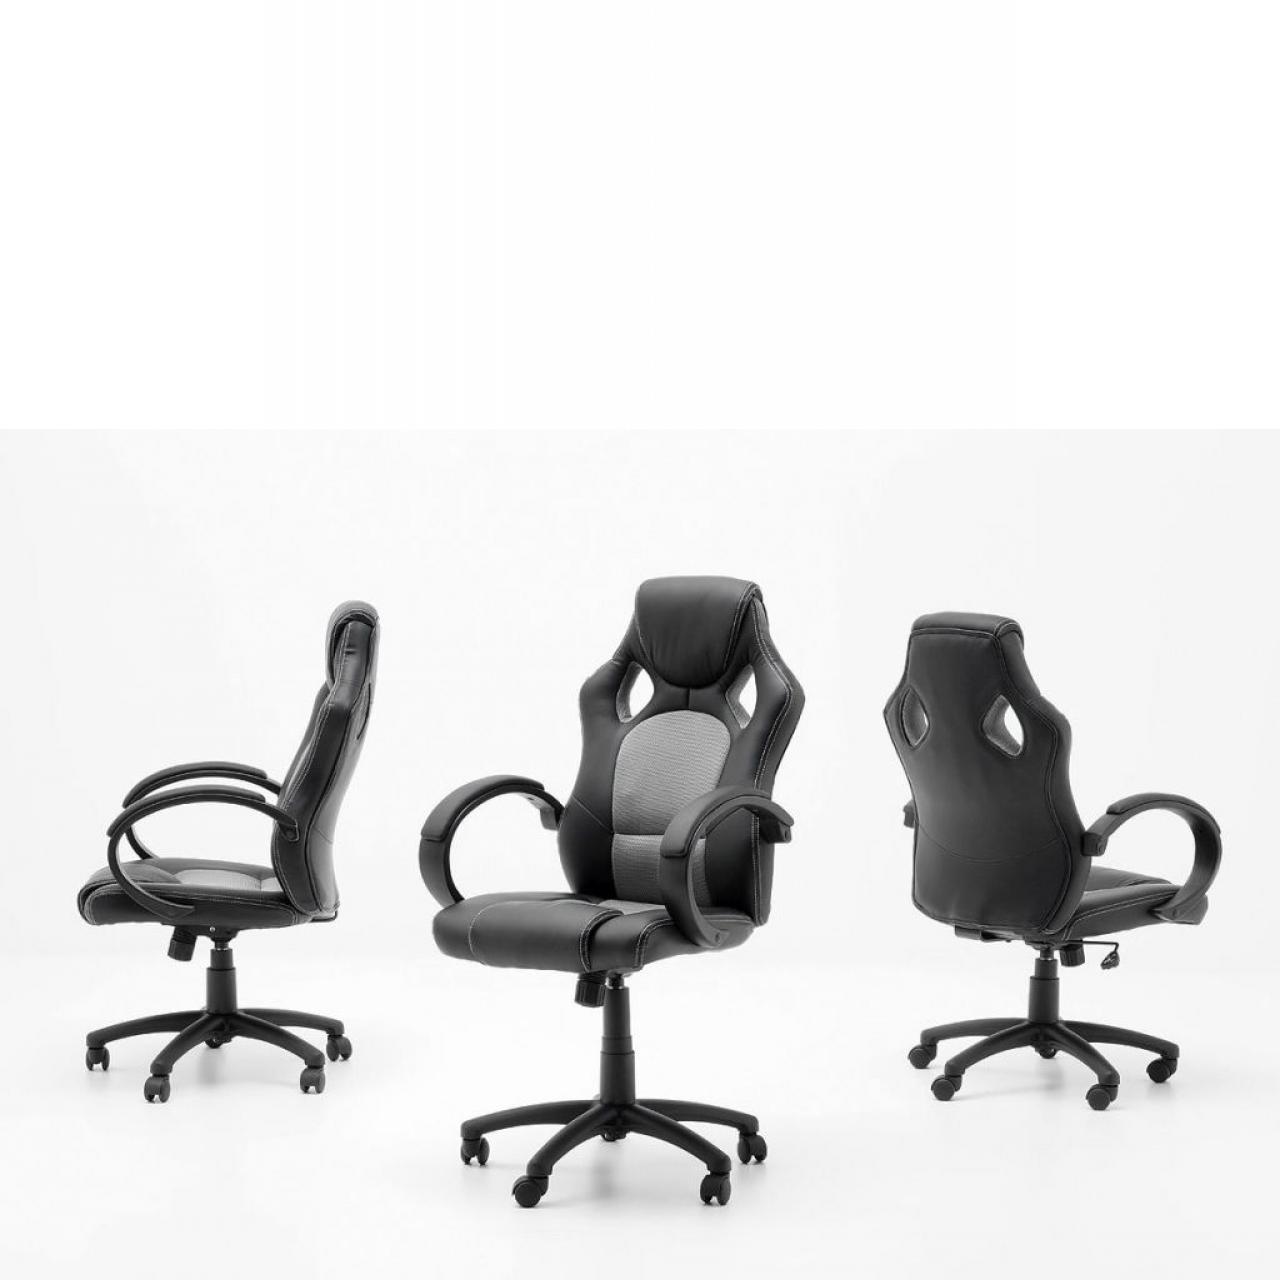 Gamingstuhl Ricky Schwarz Silber mit Armlehne Büro Drehstuhl Bürostuhl Stuhl PVC Mesh